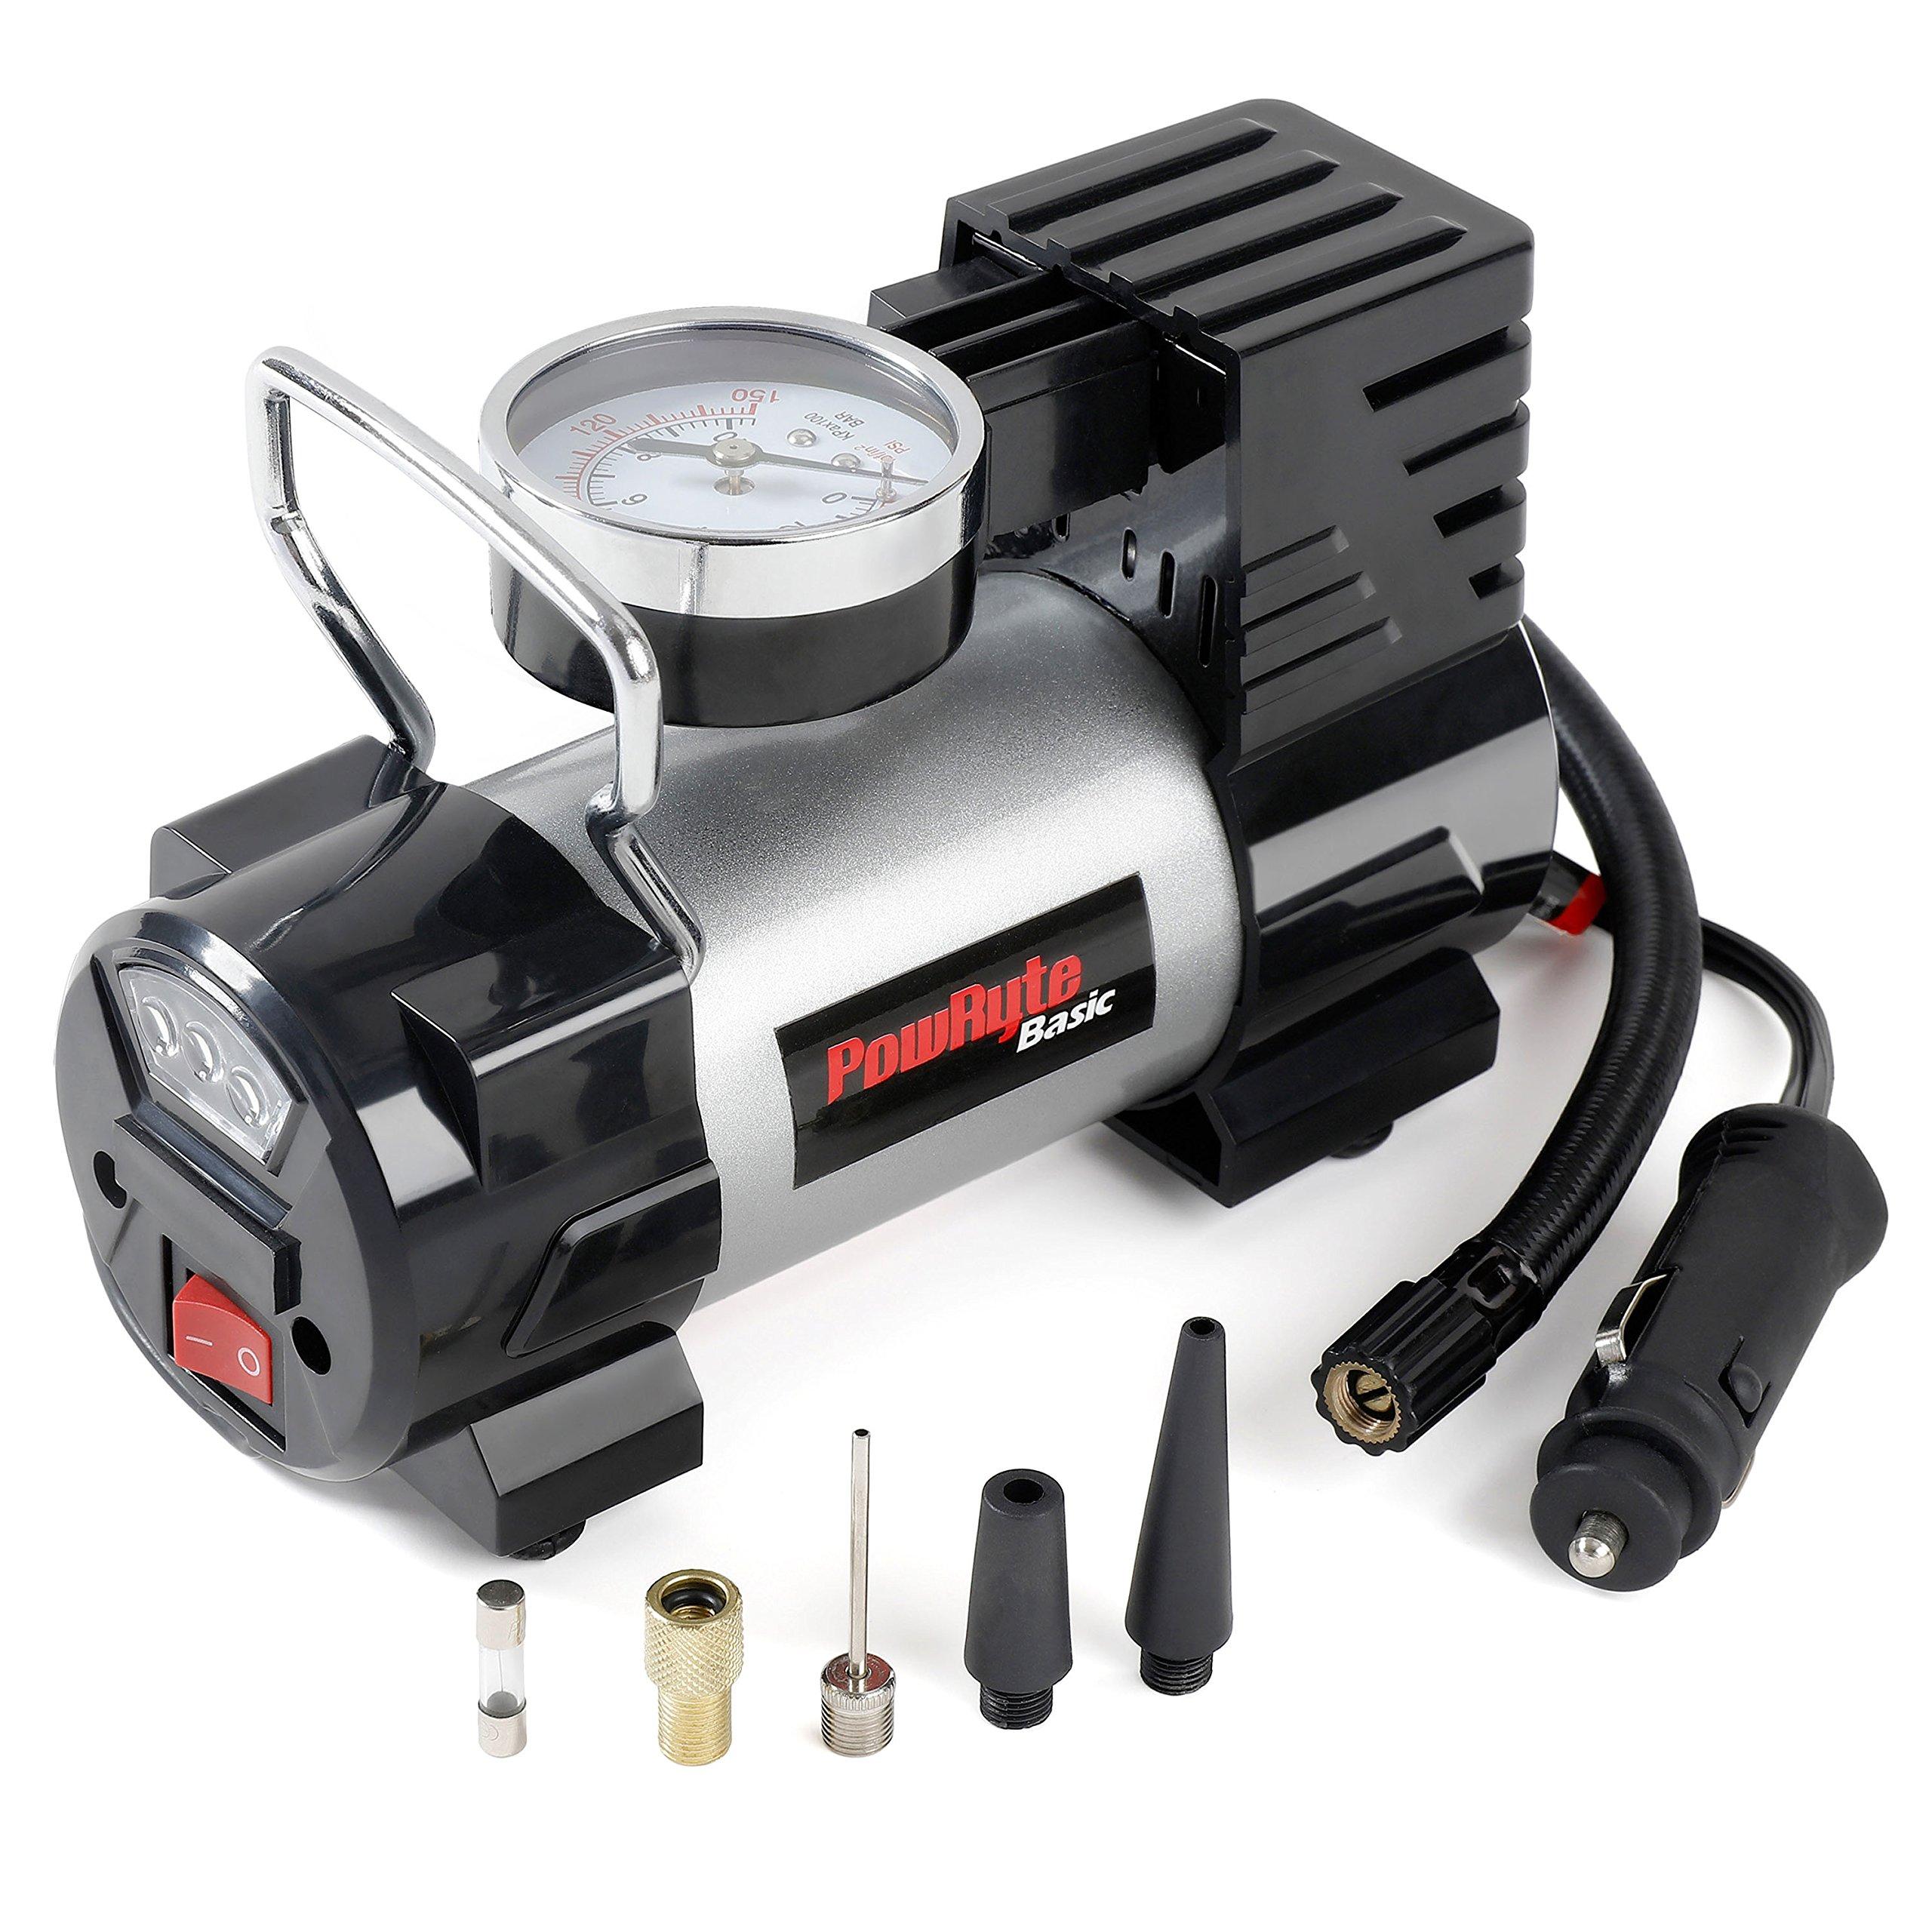 Portable Car Air Compressor Heavy Duty Inflator Tire Pump